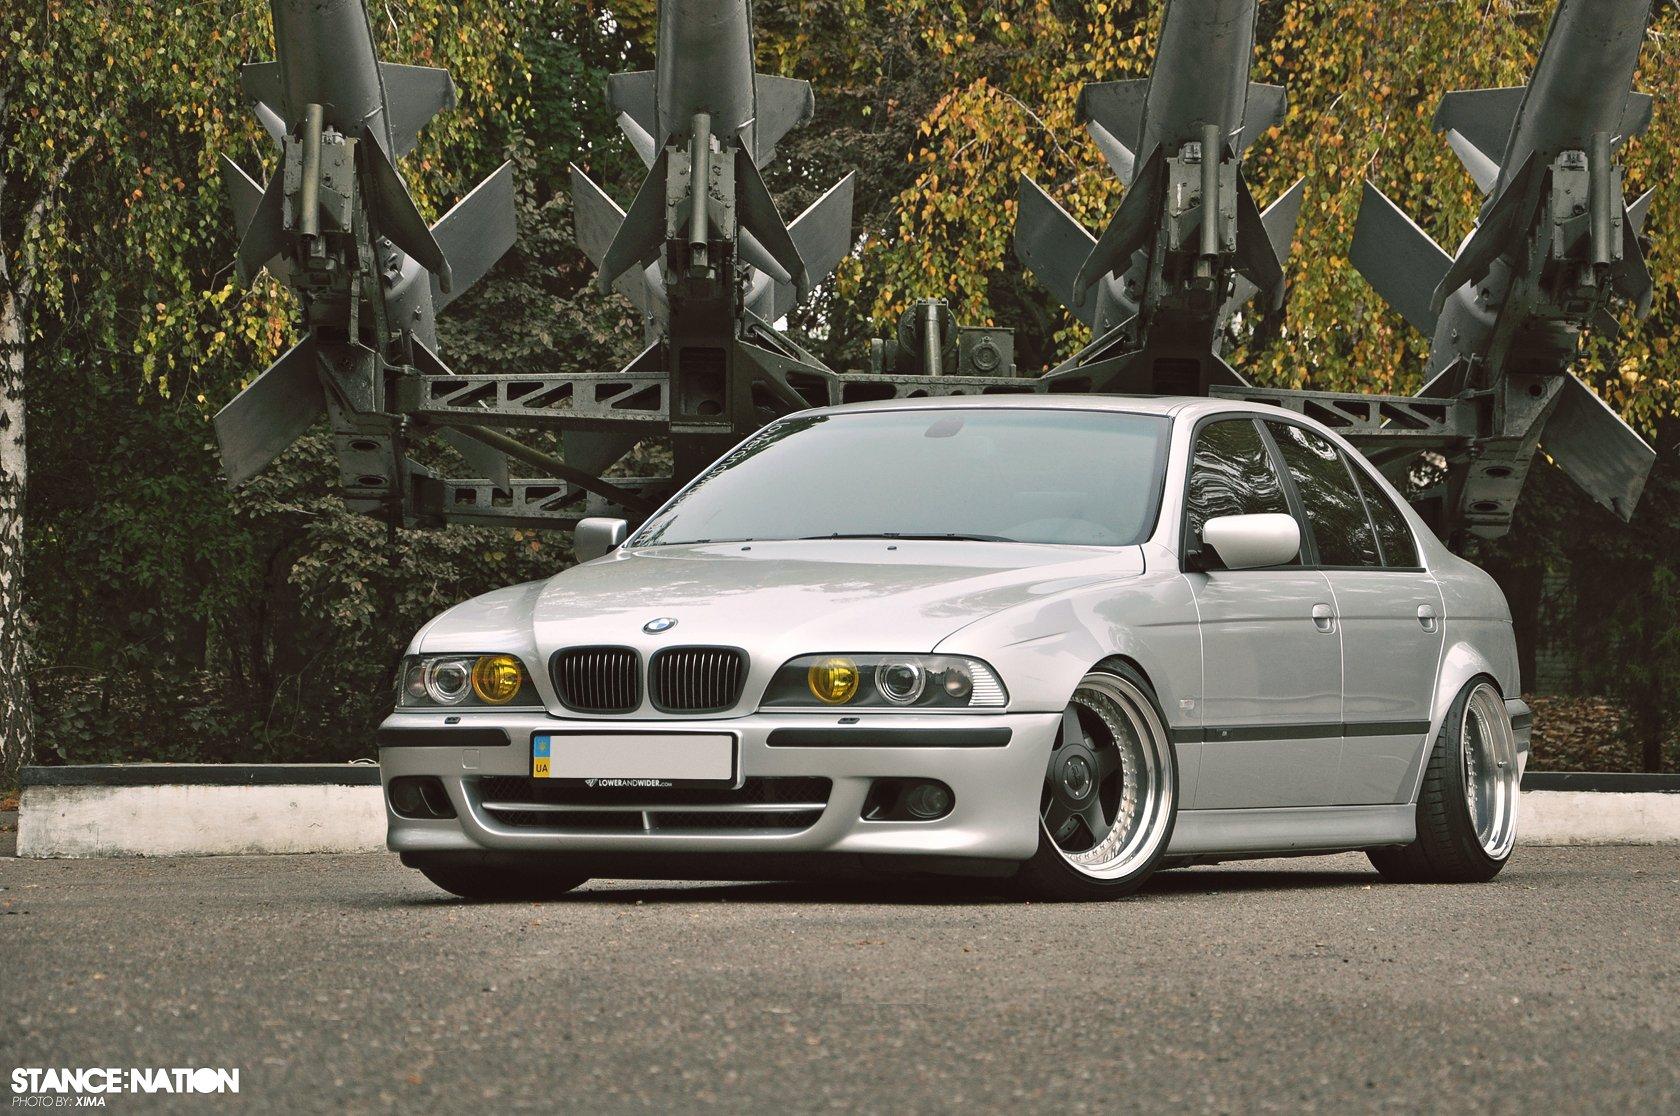 Bmw E39 M5 >> BMW E39 M-5 custom tuning wallpaper | 1680x1116 | 845776 | WallpaperUP